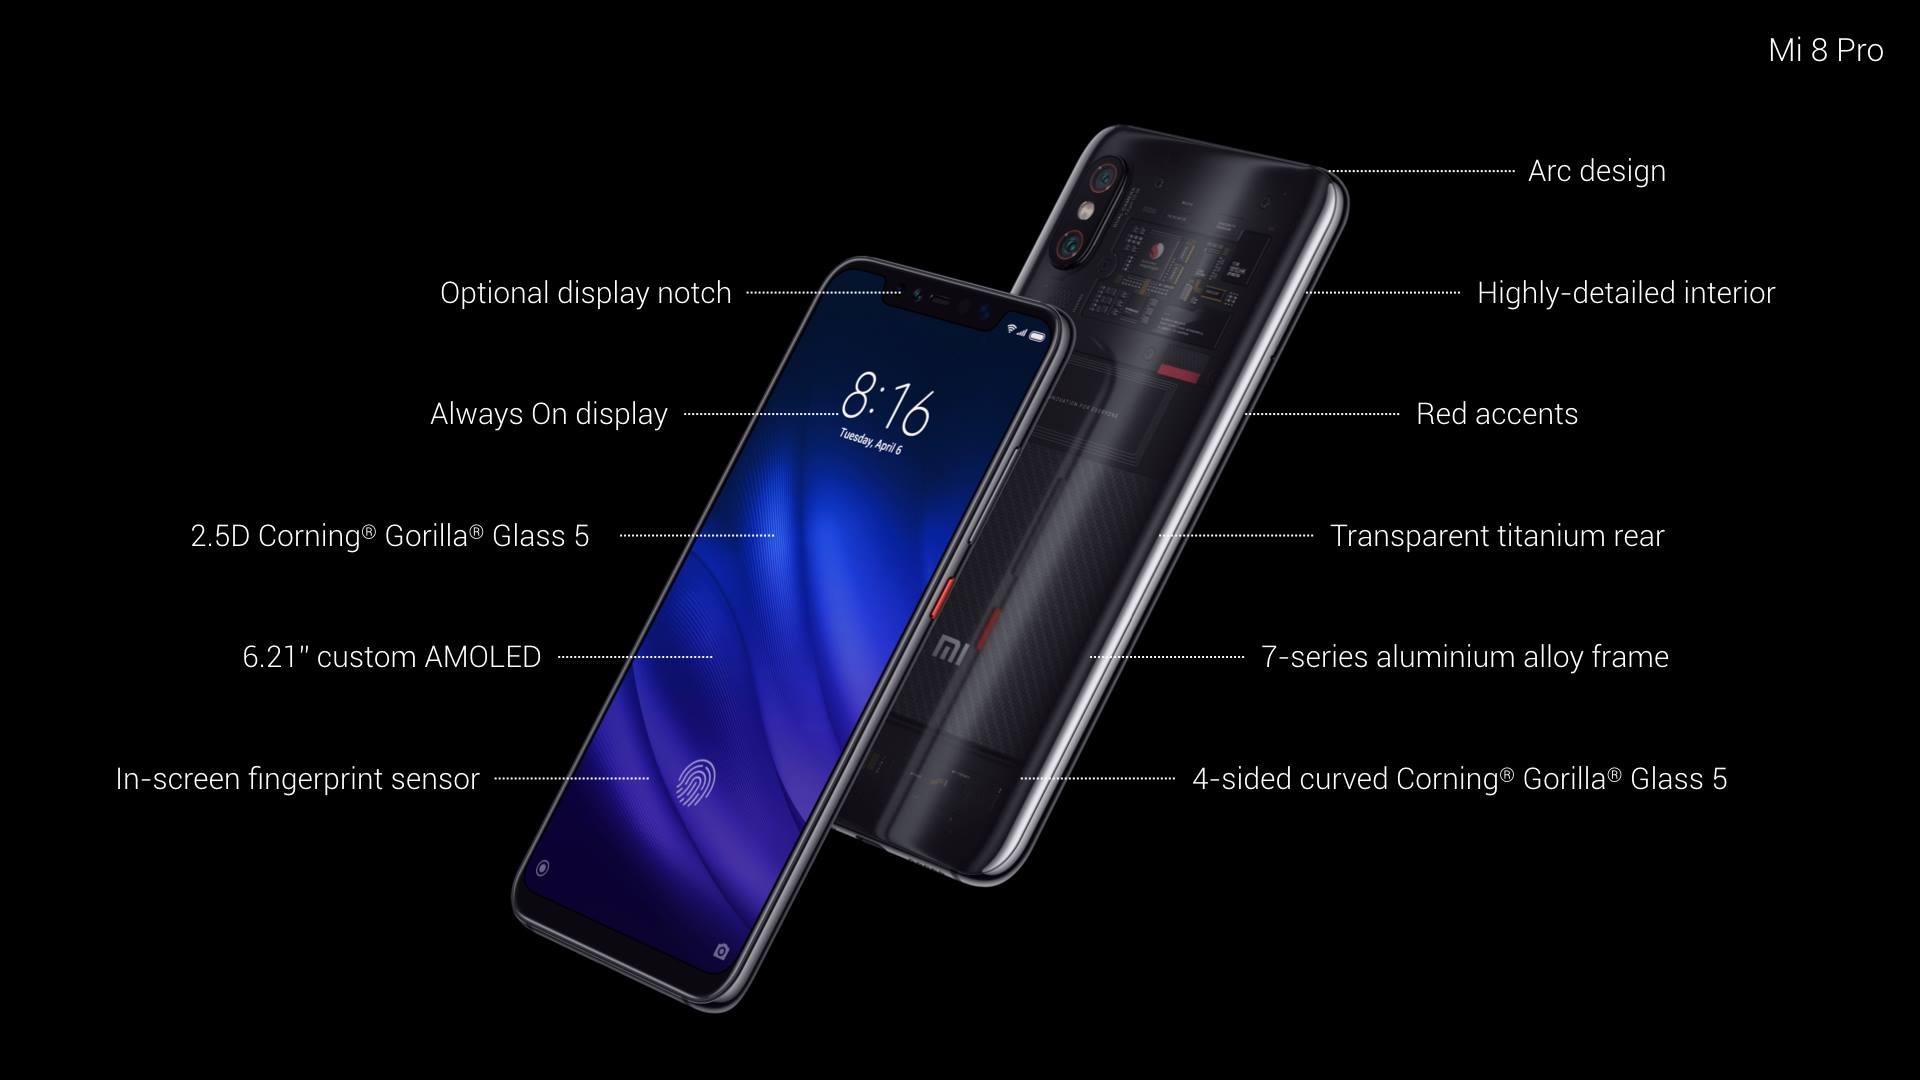 يأتي Xiaomi Mi 8 Pro شاومي مي 8 برو مزودا بشاشة AMOLED